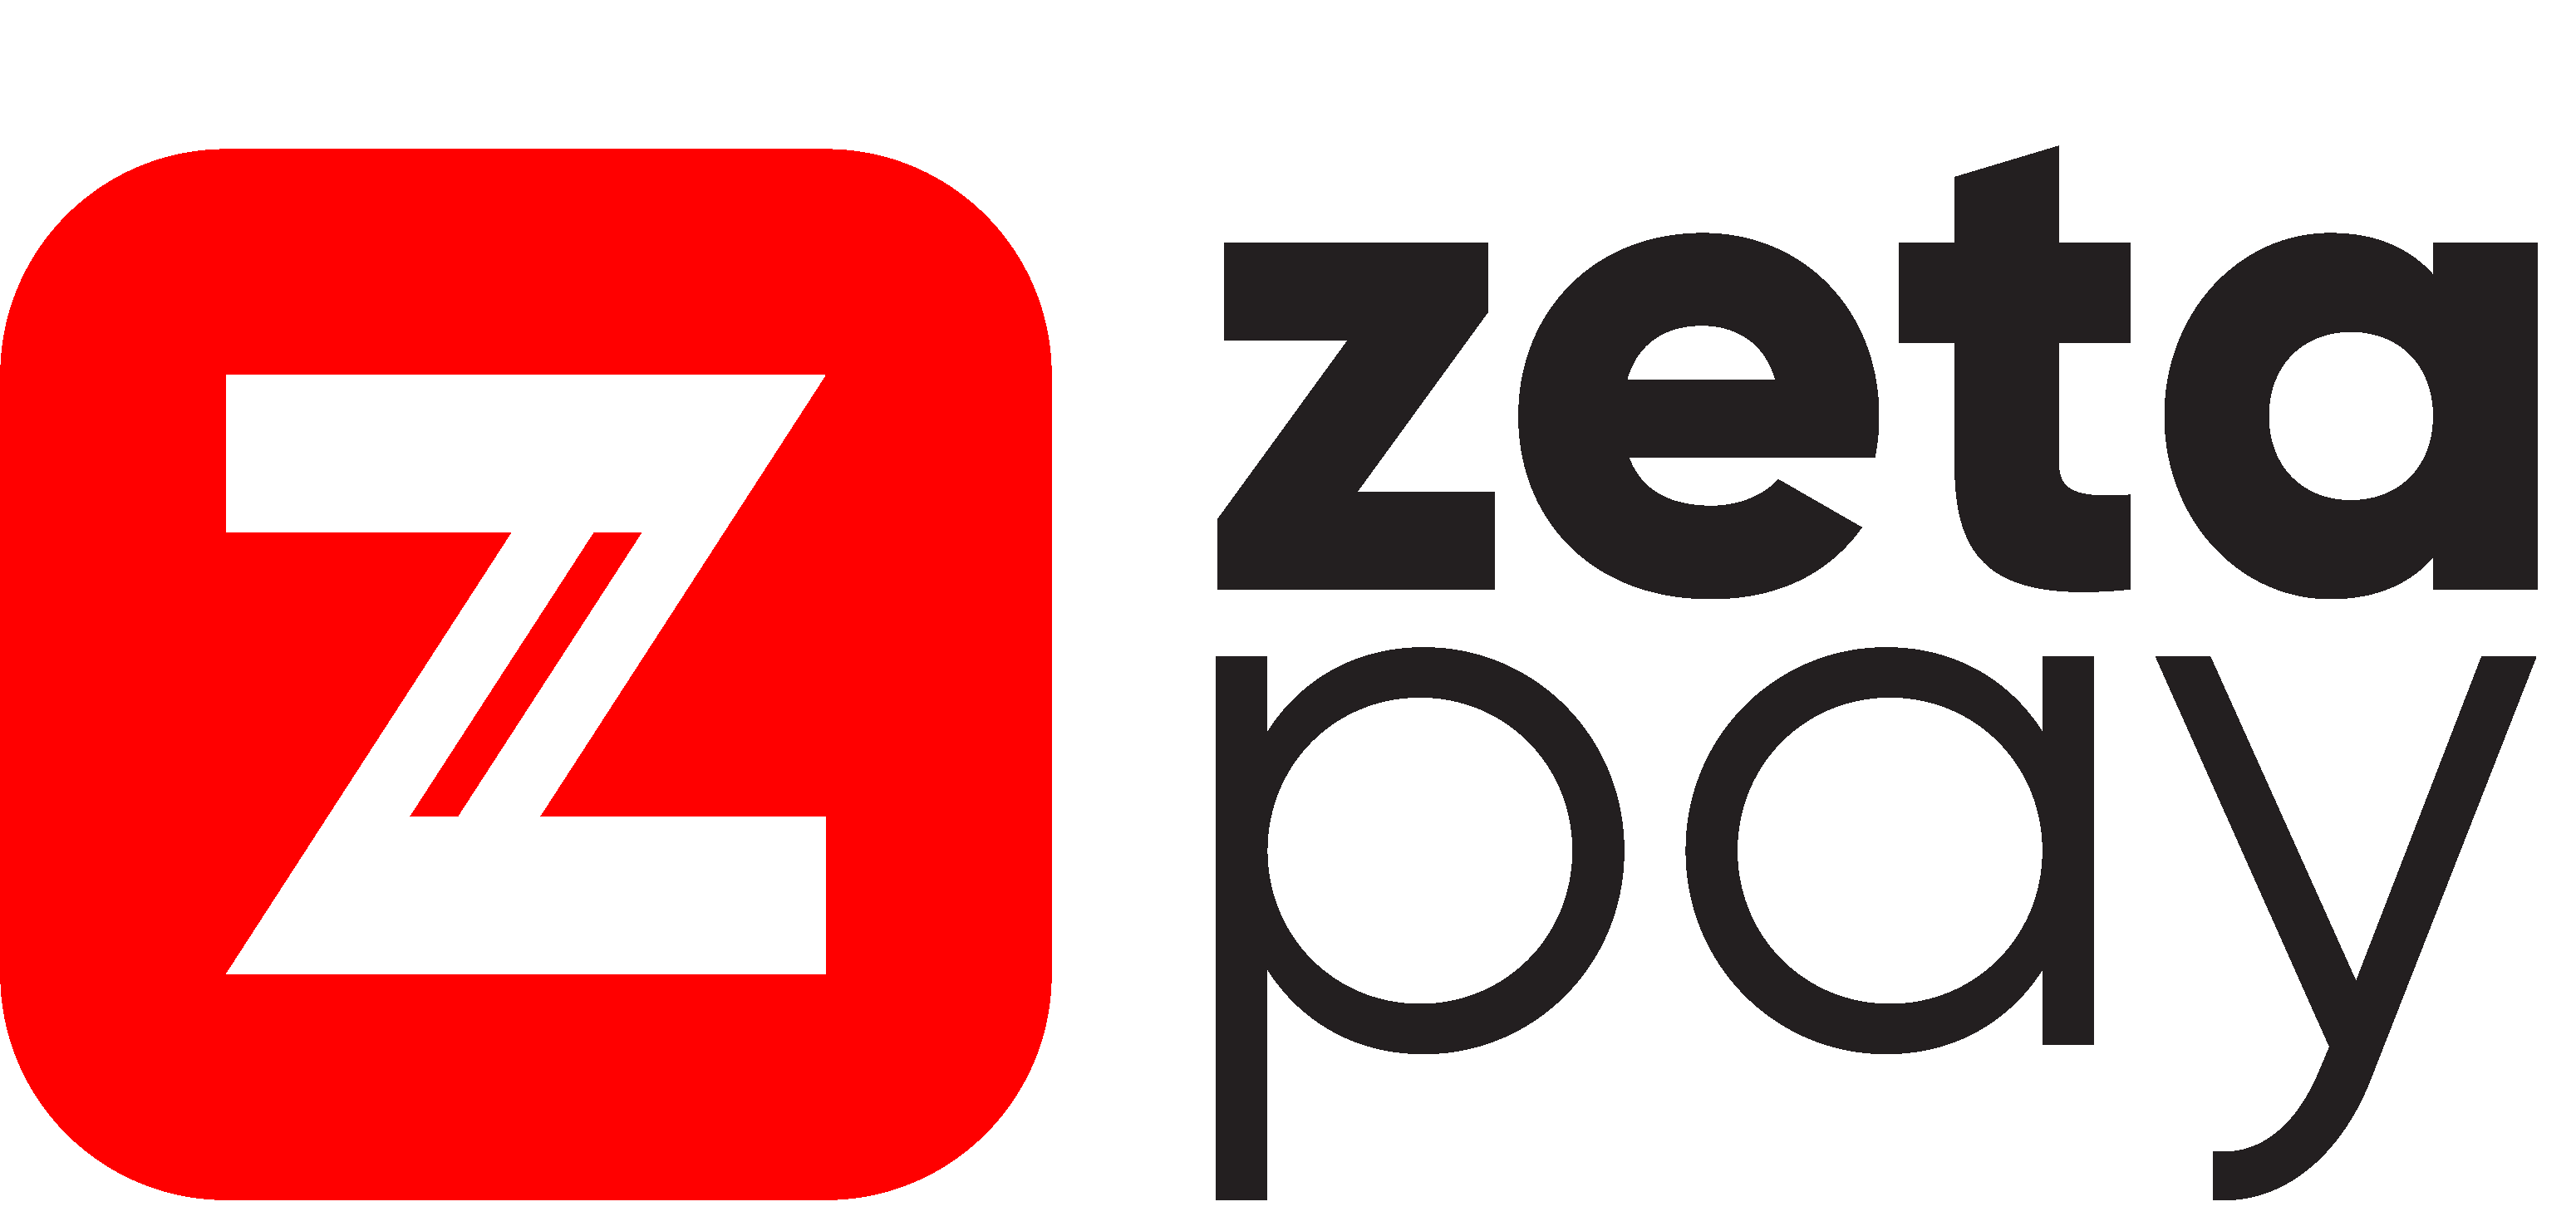 ZetaPay – Payment Processing + Merchant Cash Advance + Business Funding